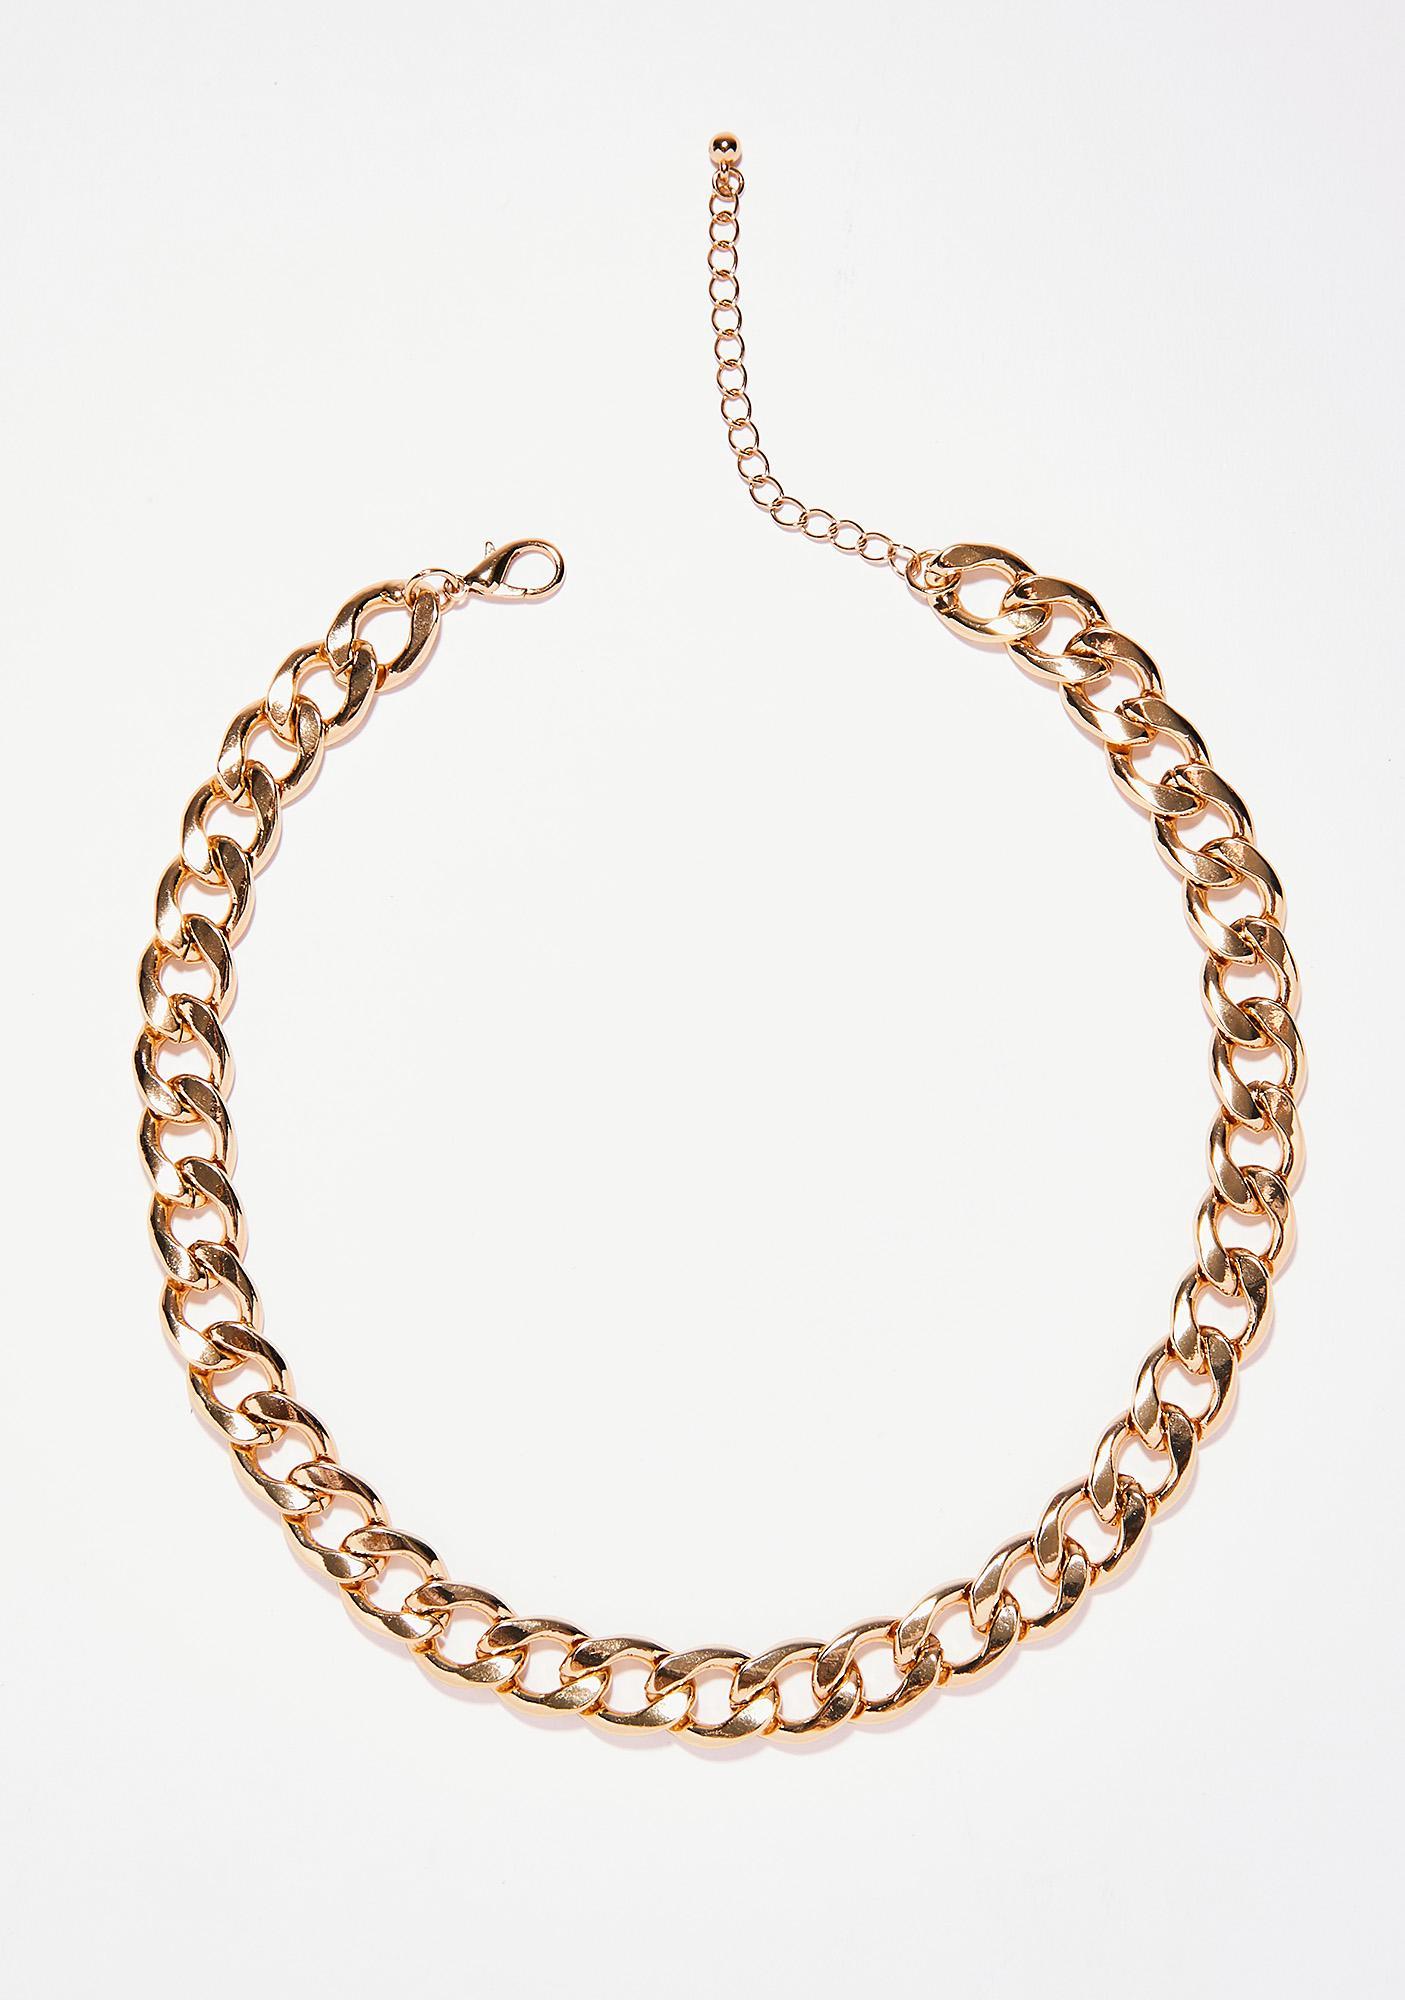 Gold Chroma Jewelry Set